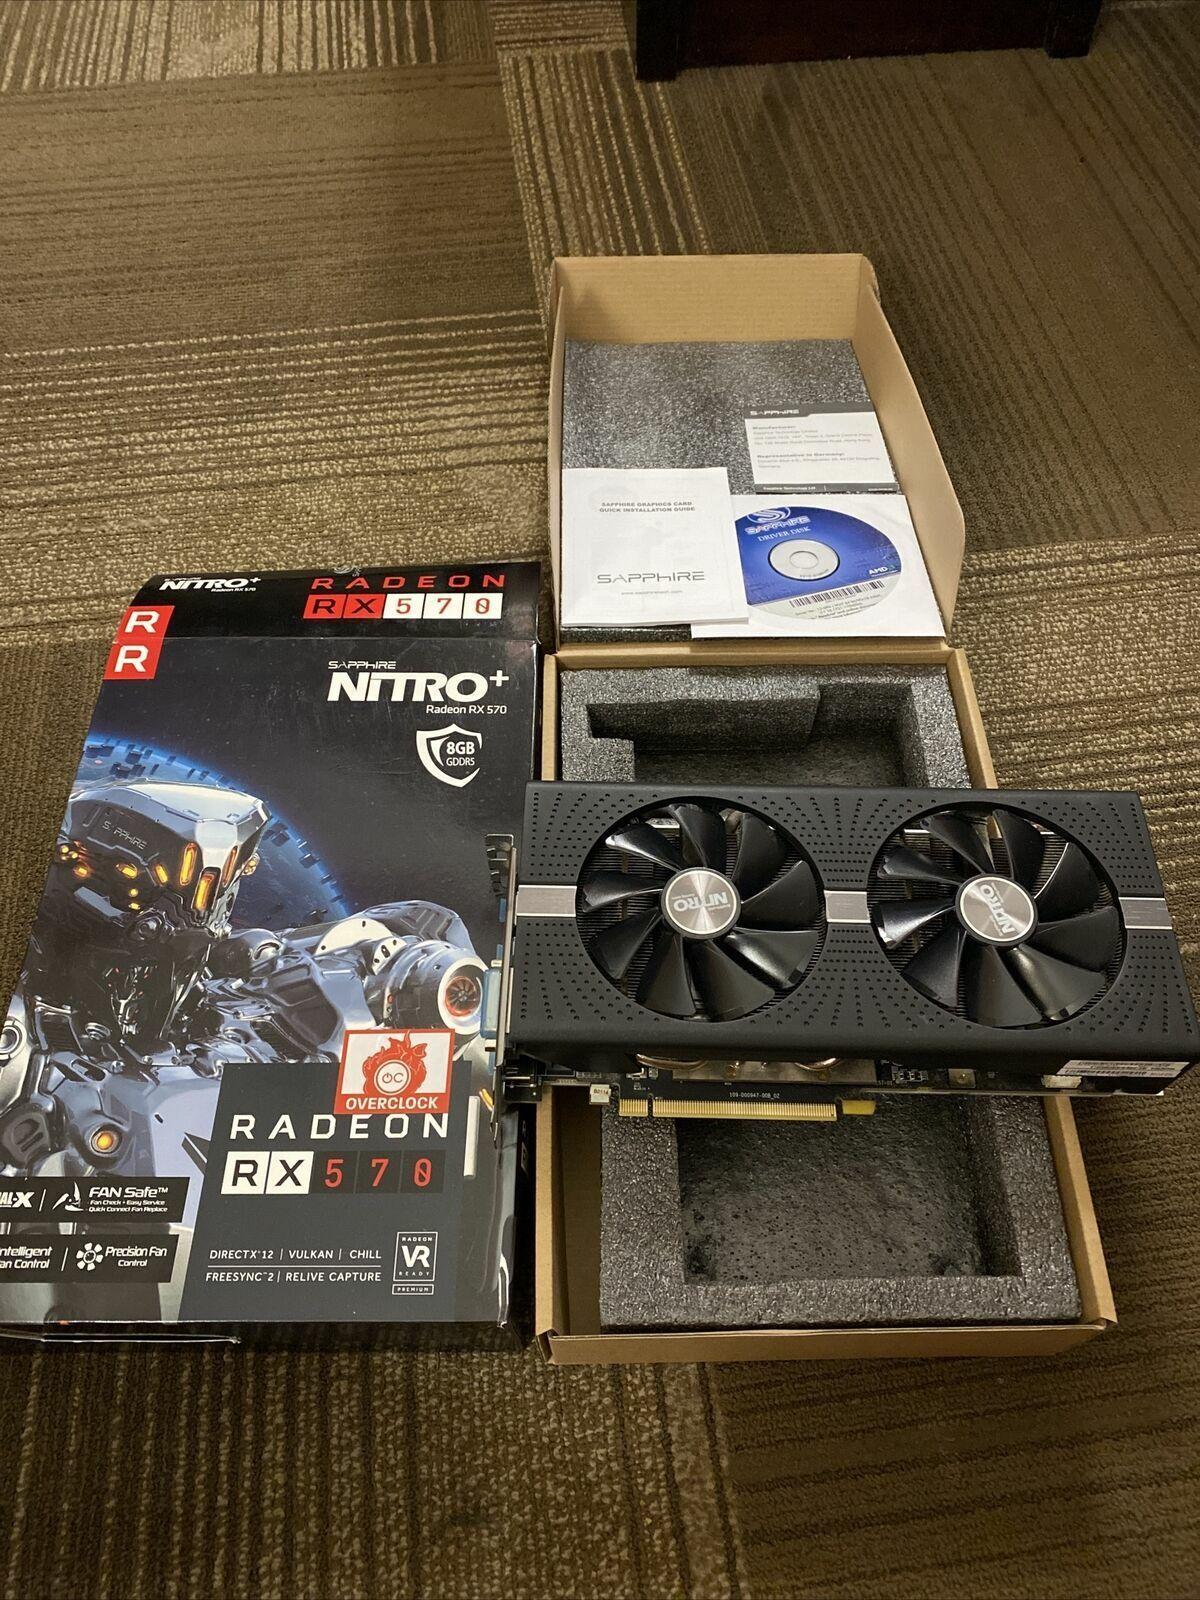 SAPPHIRE Radeon NITRO+ RX 570 8GB GDDR5 PCI-Express Graphics Card